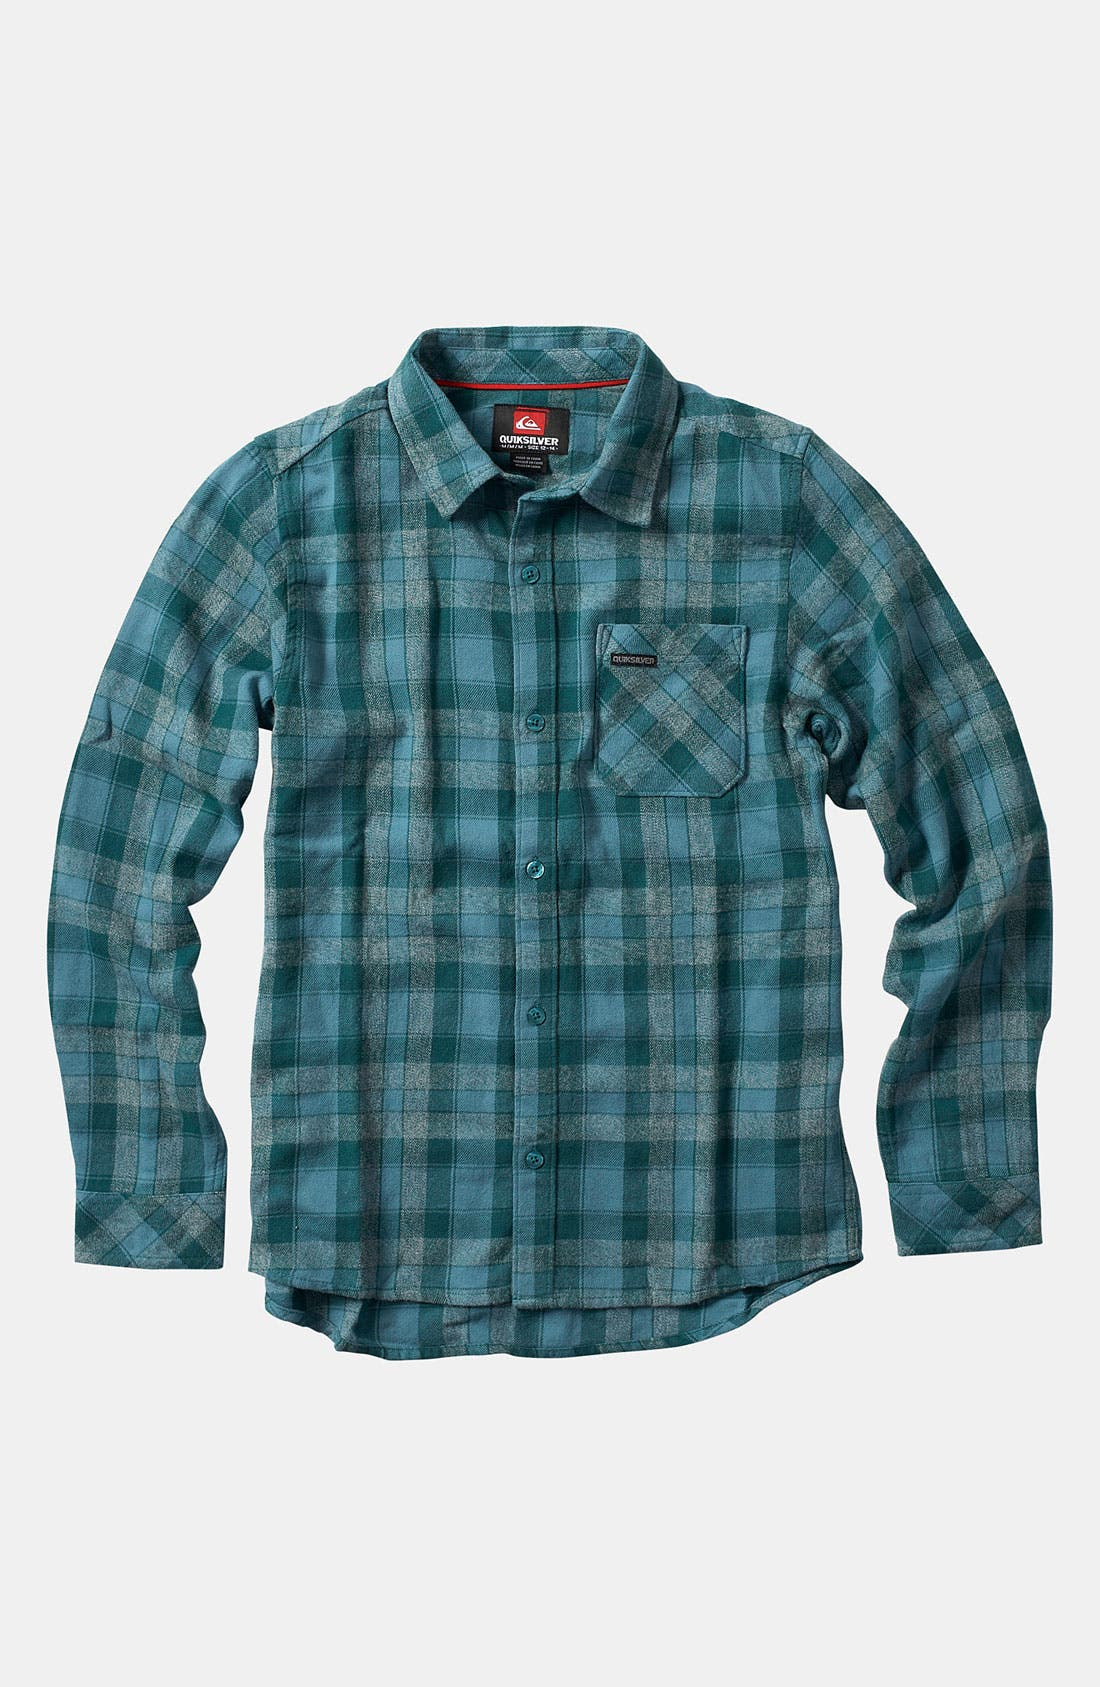 Alternate Image 1 Selected - Quiksilver Flannel Shirt (Big Boys)